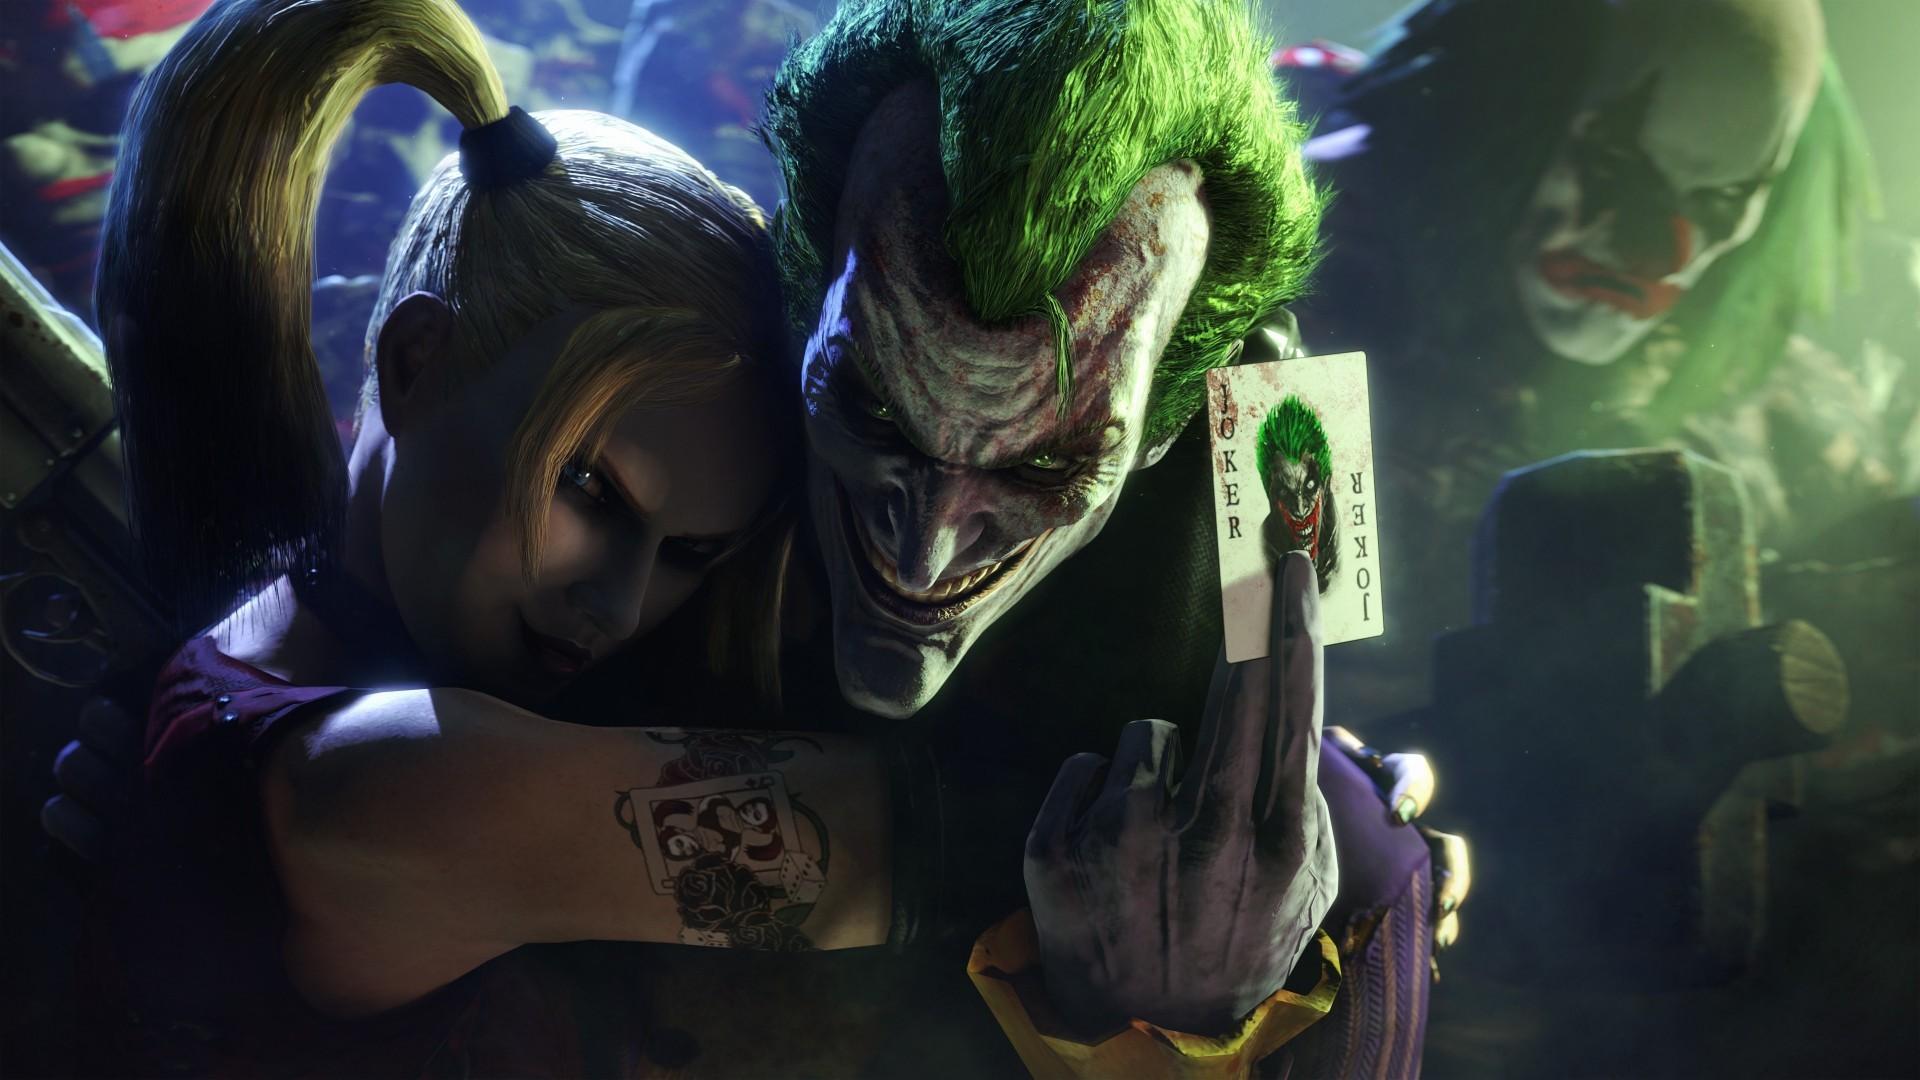 Harley Quinn, Joker, Suicide Squad